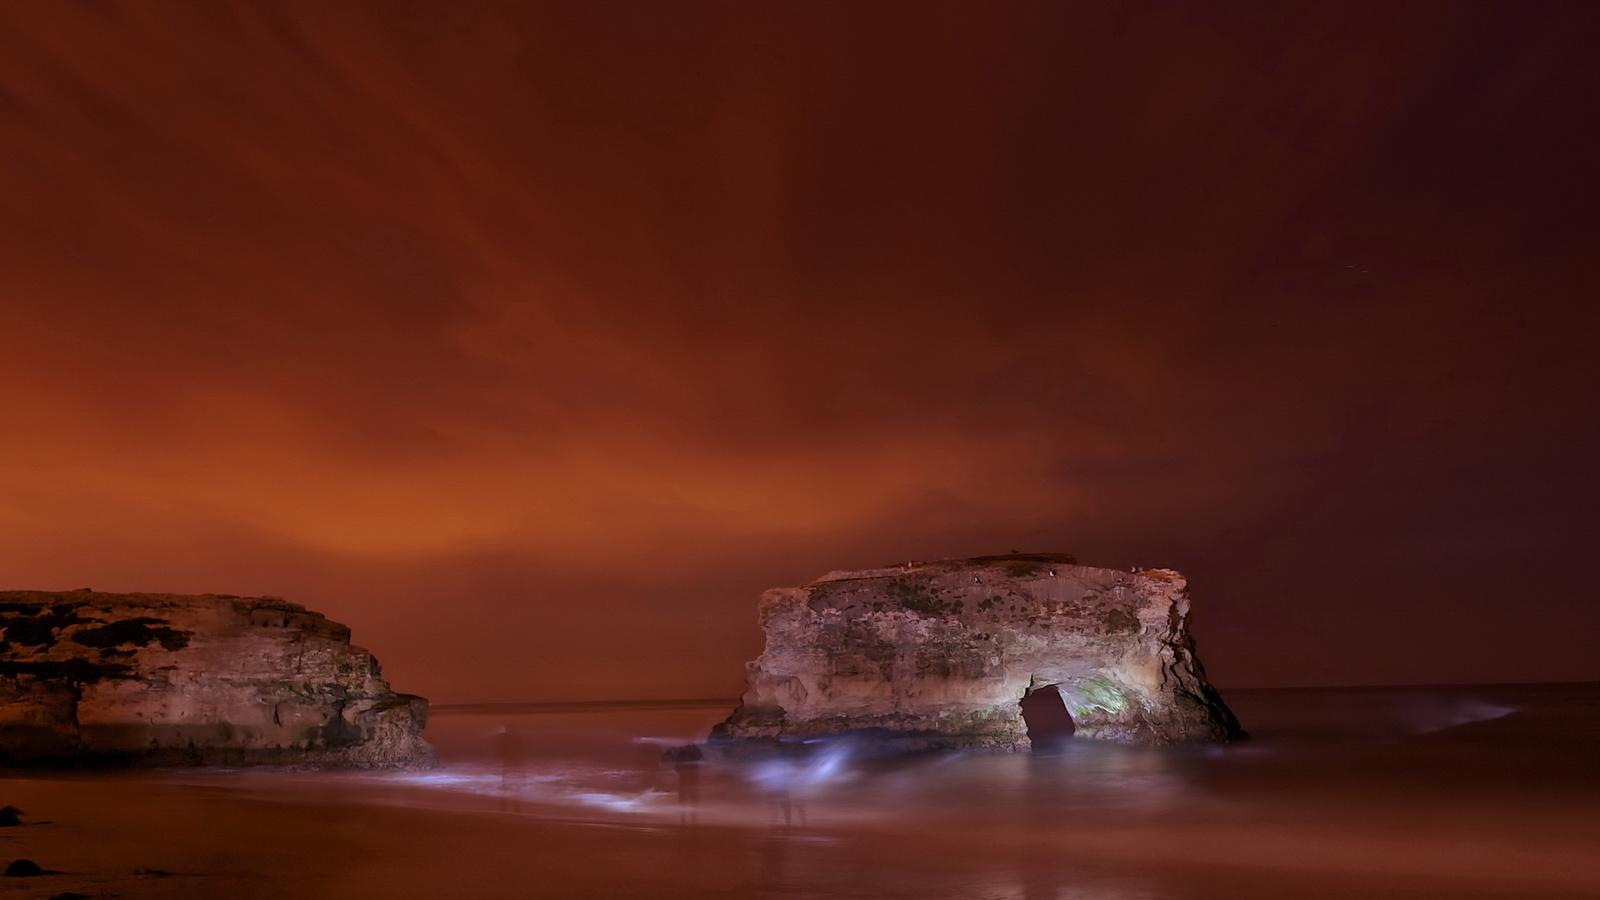 ночь, море, скалы, призраки